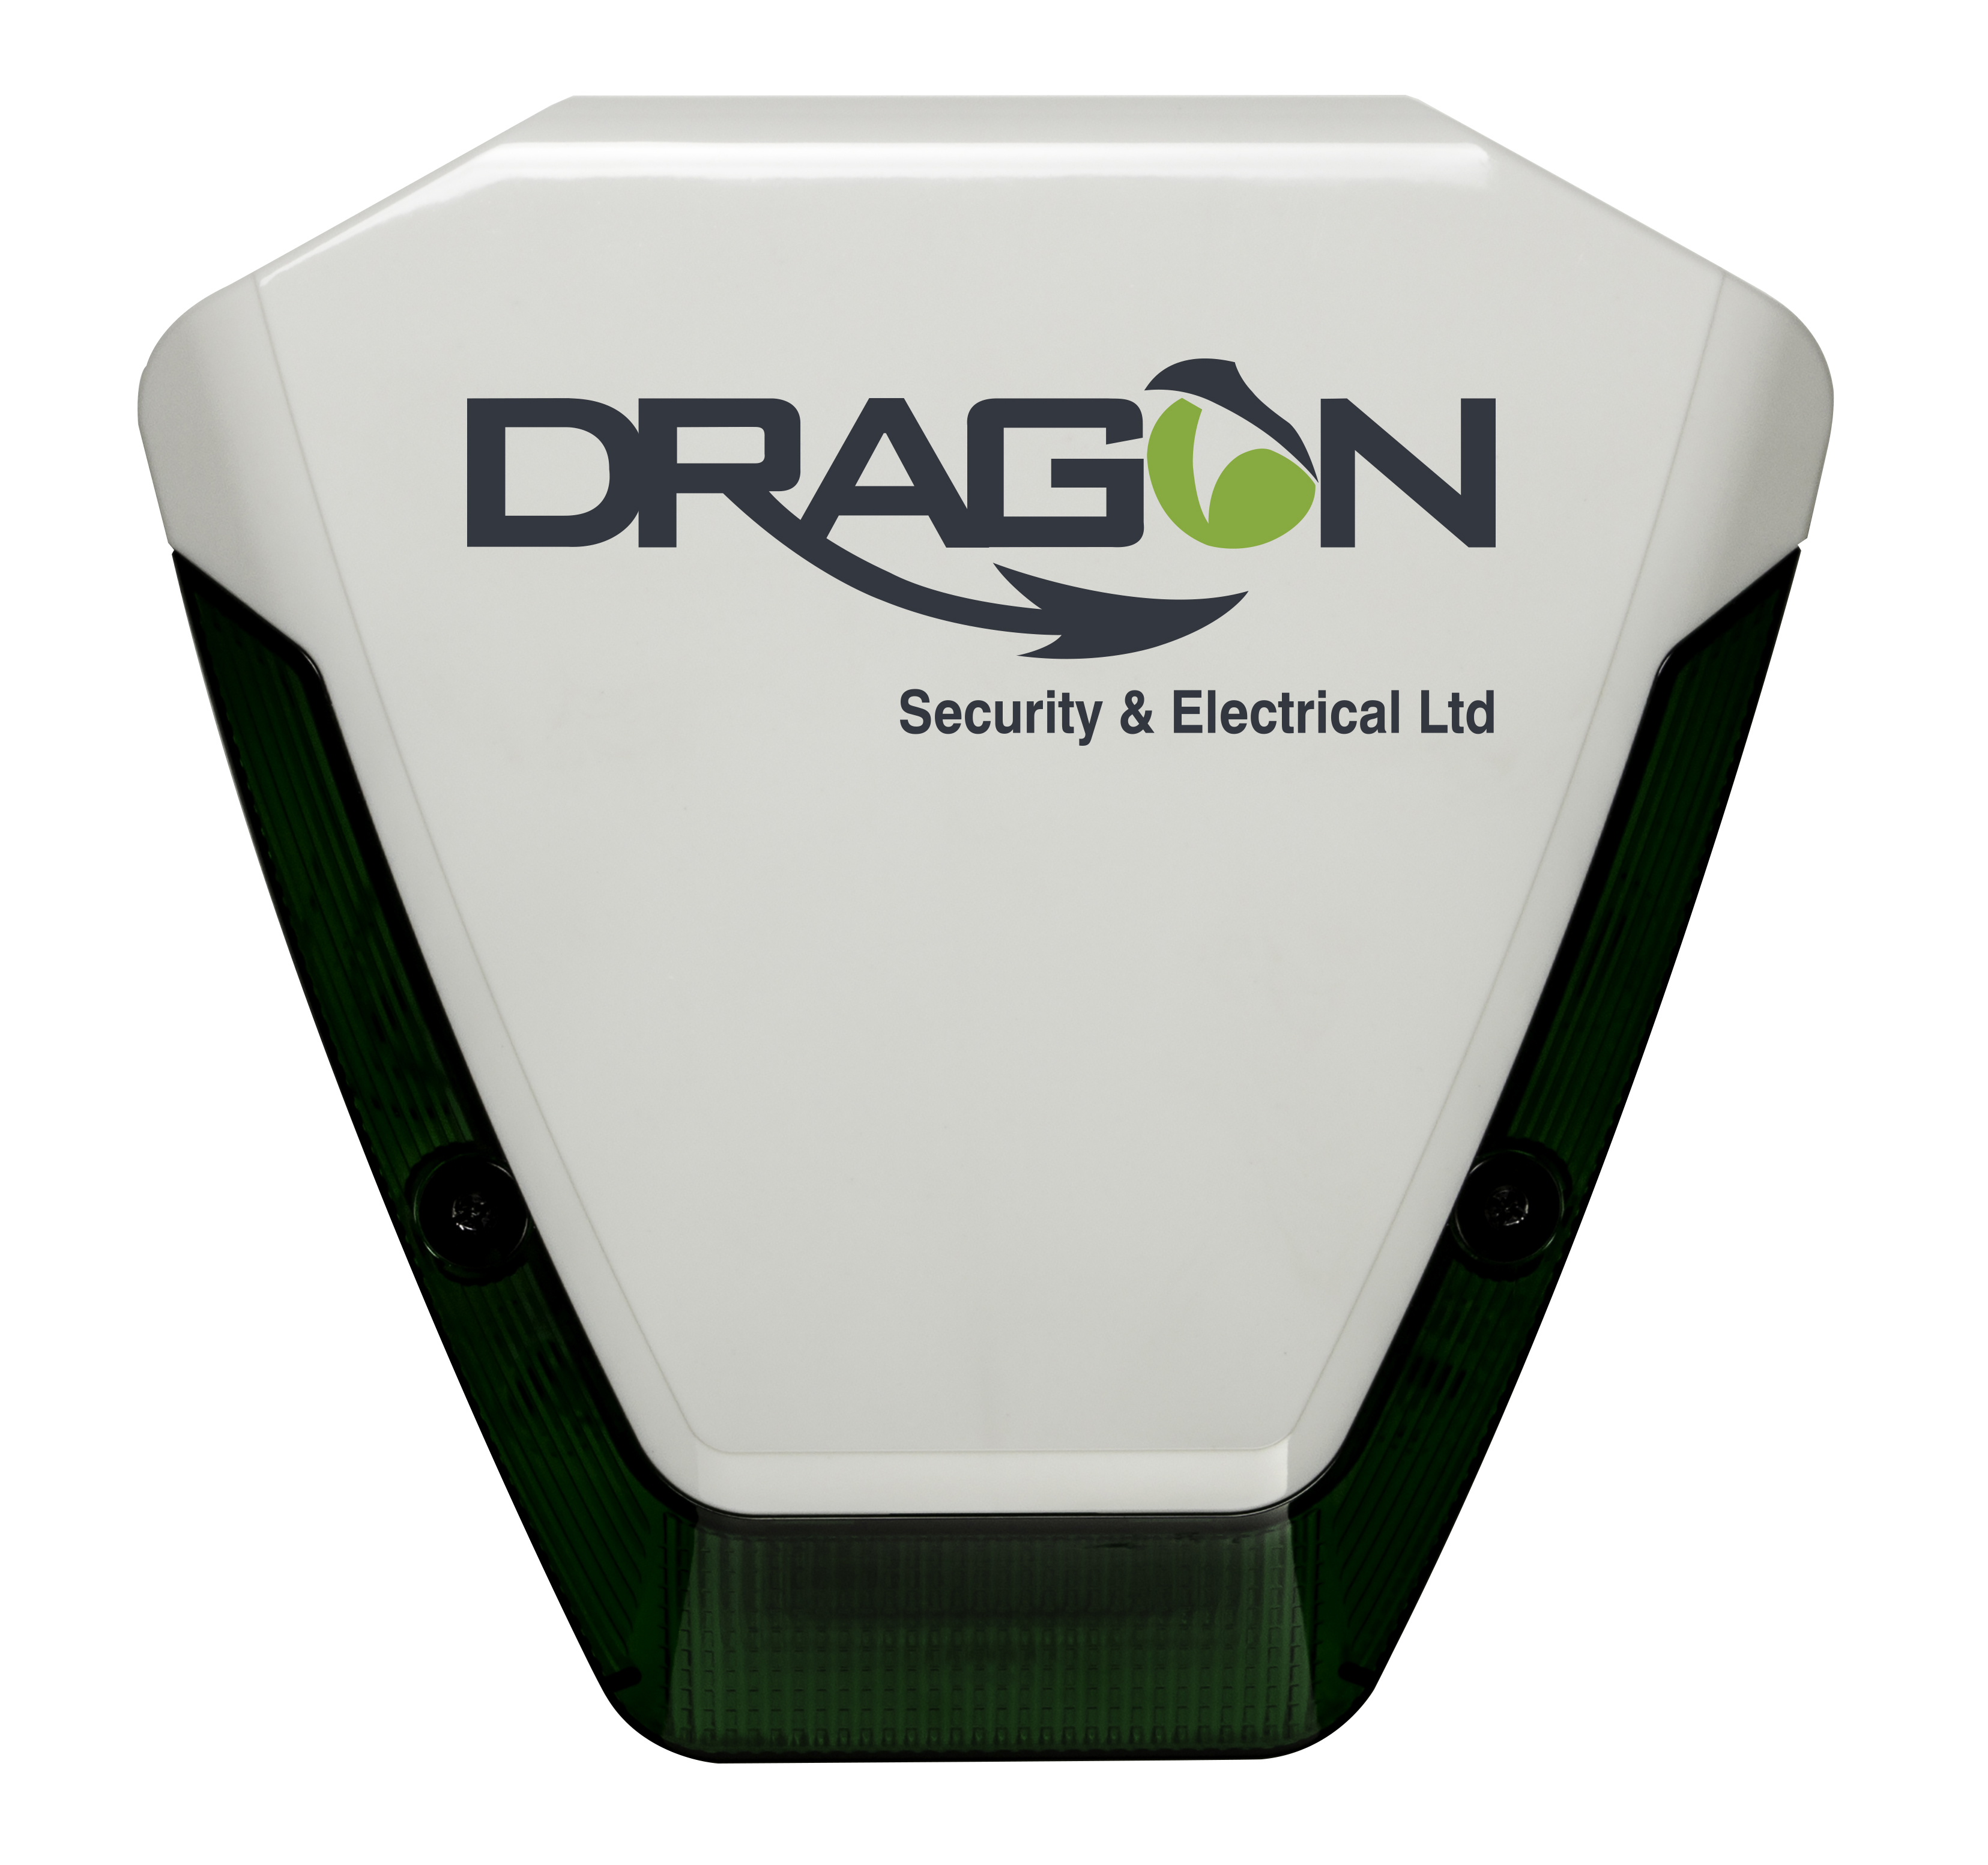 Alarm sounder with dragon logo